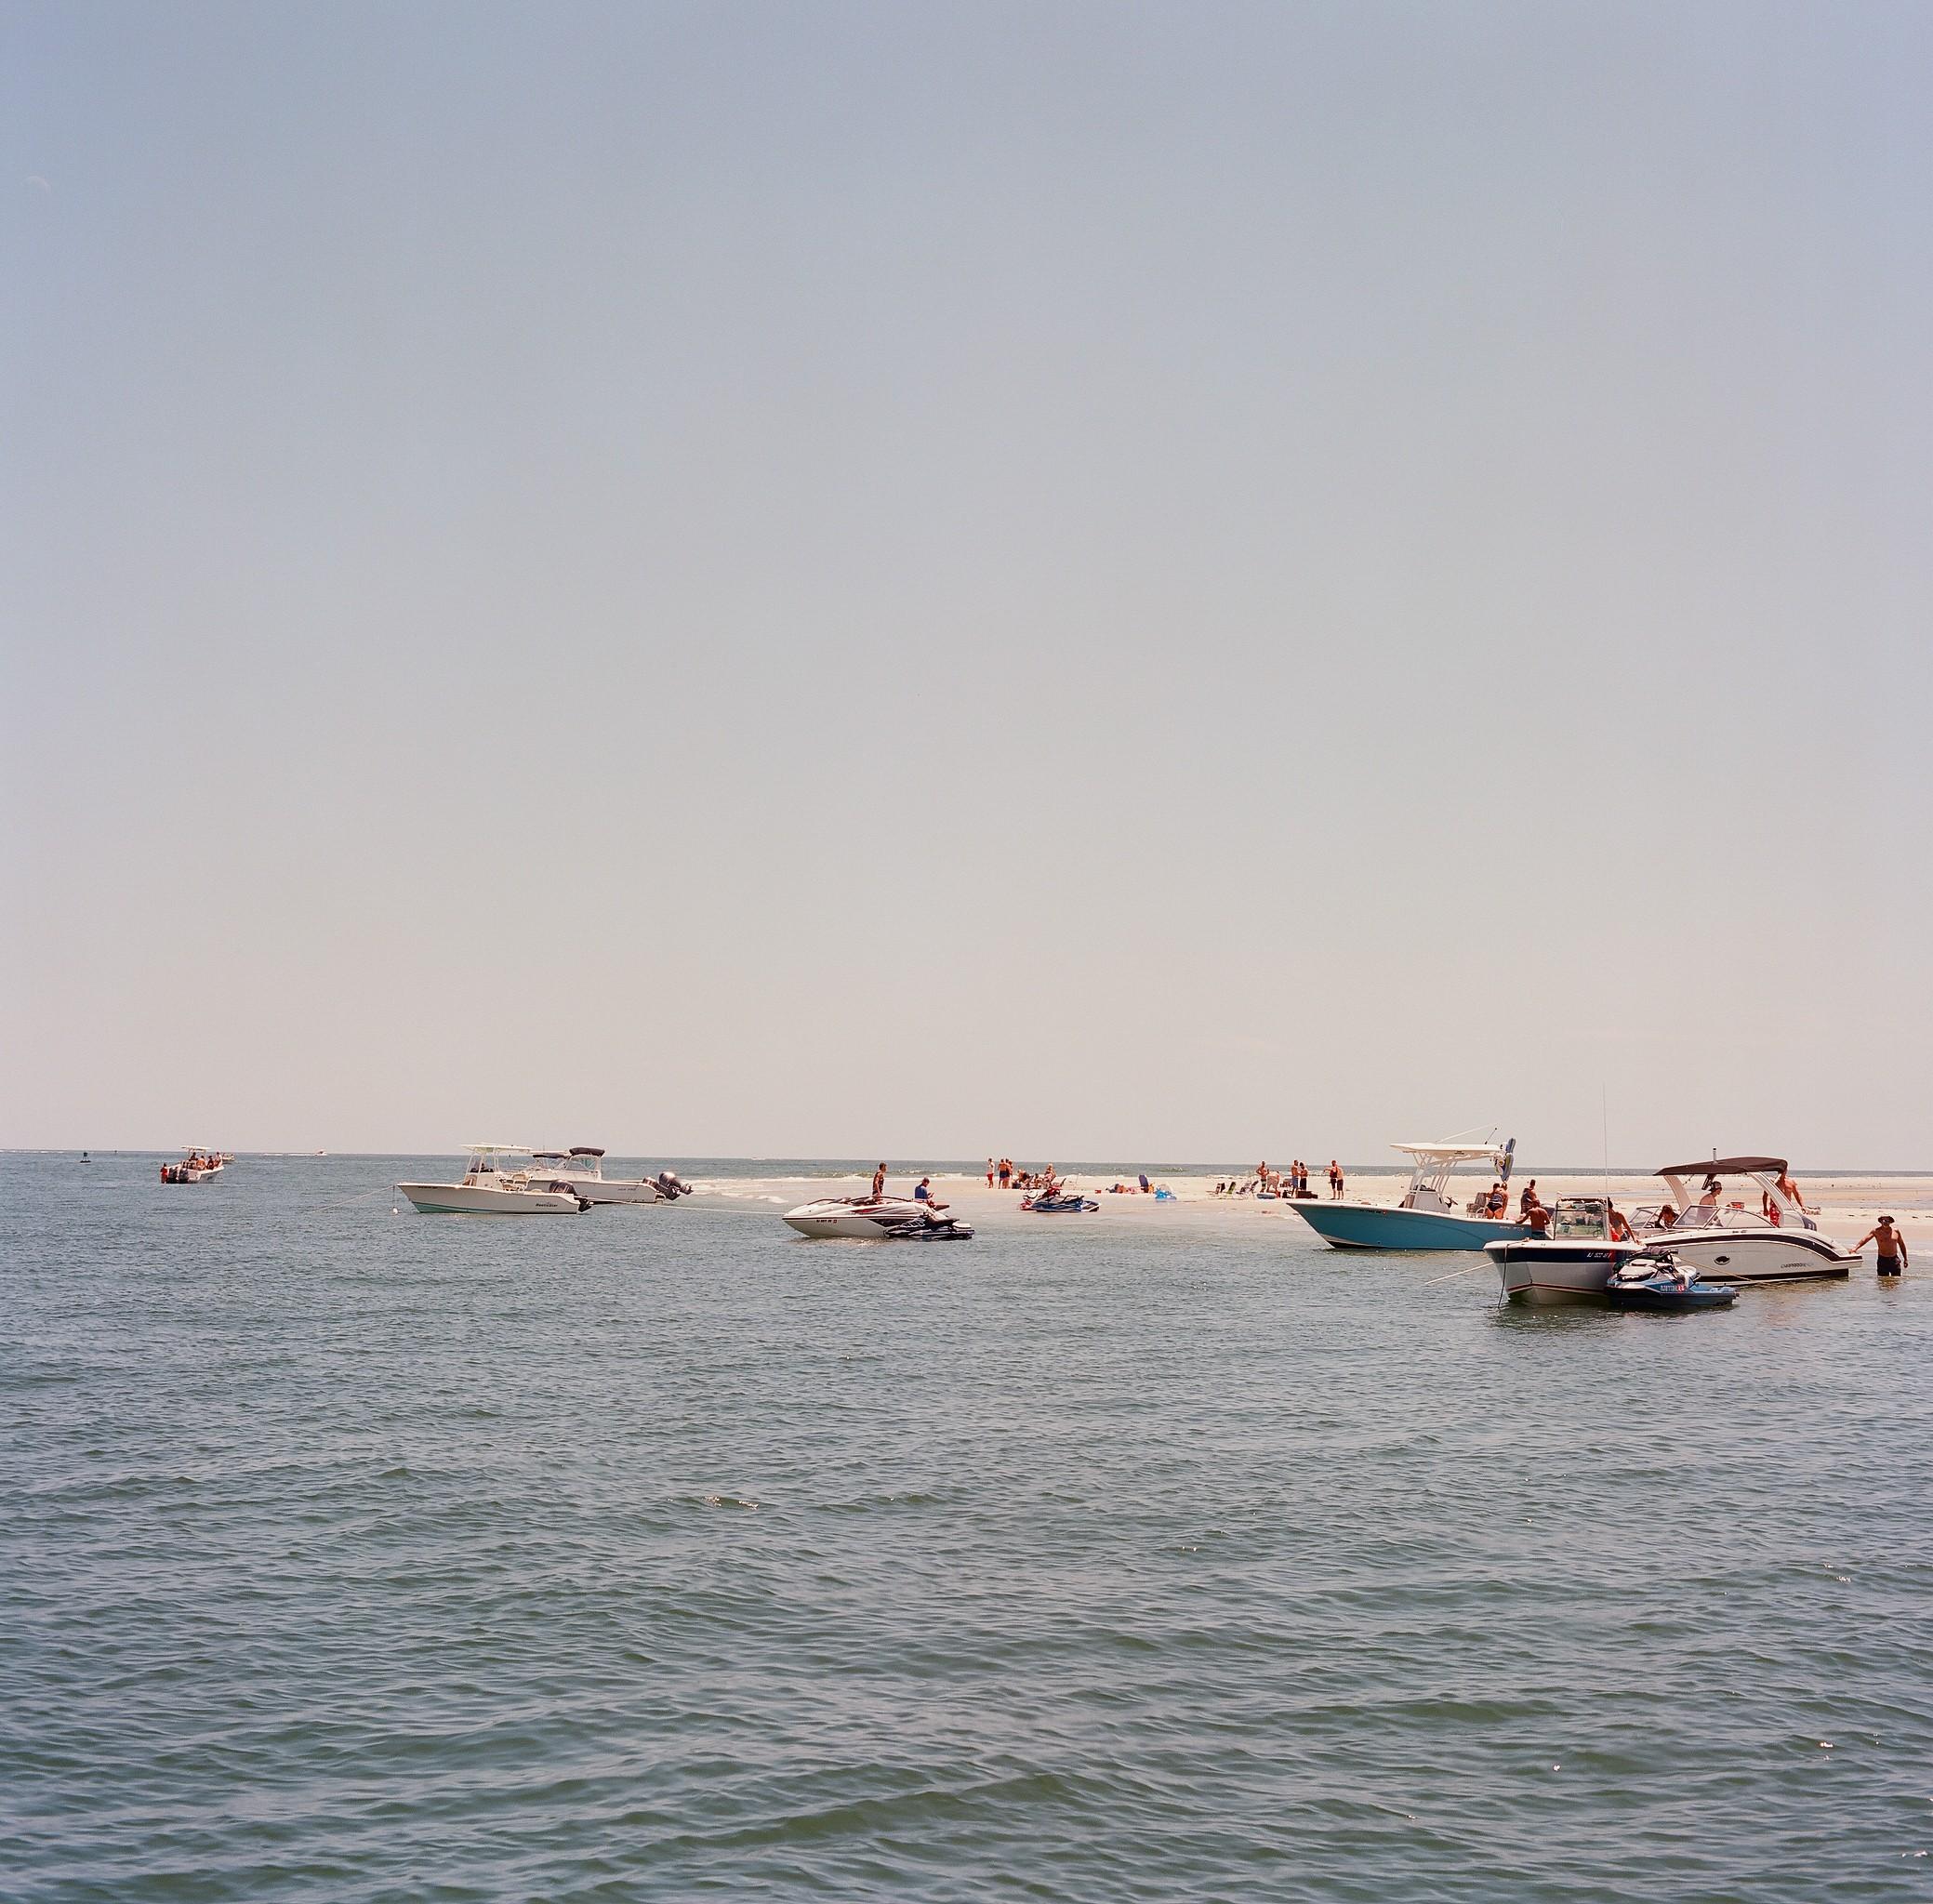 Boats gathered at a sandbar in the bay, shot on medium format film.